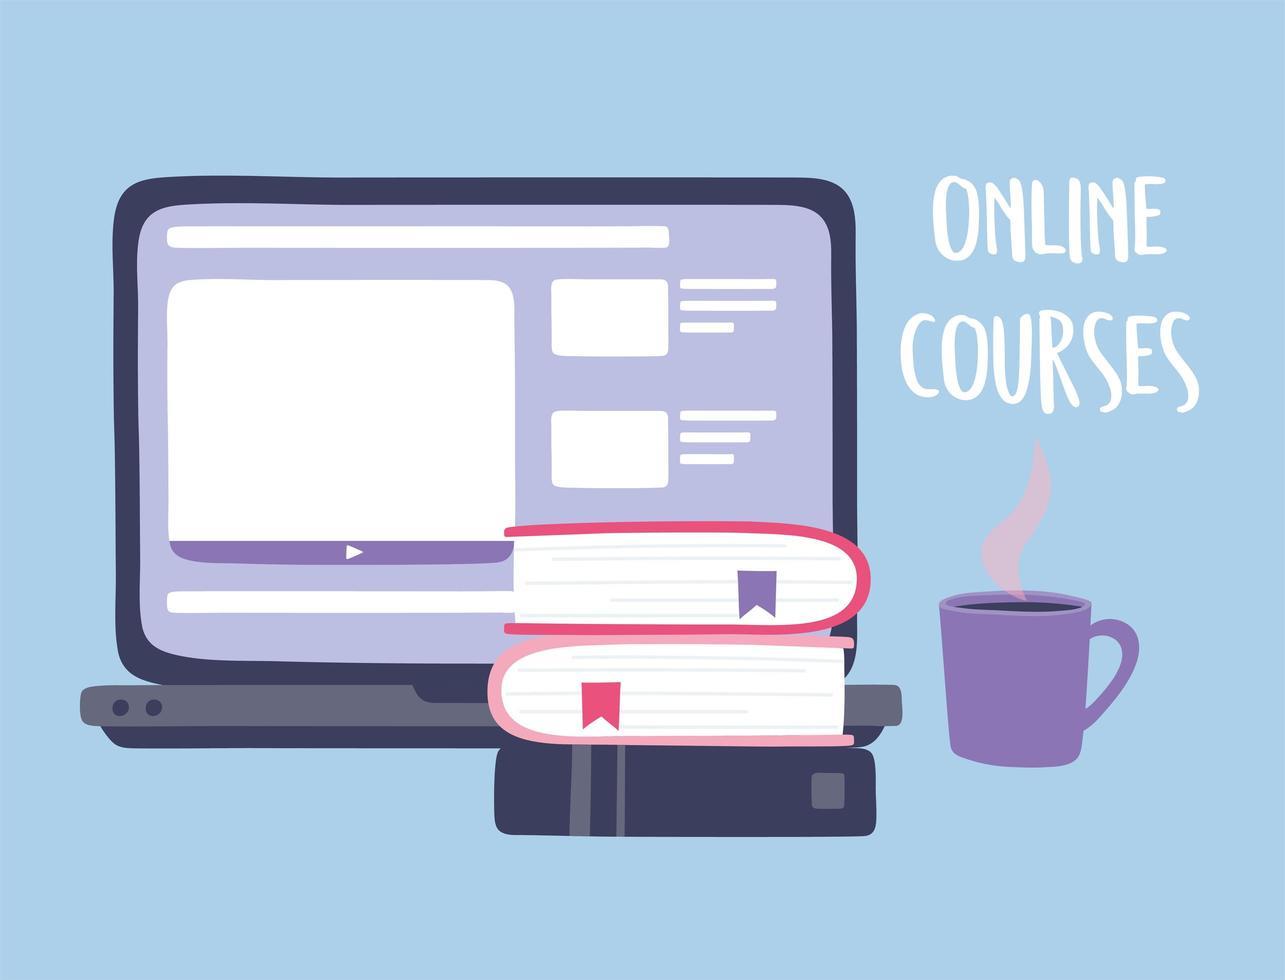 cursos online con computadora vector